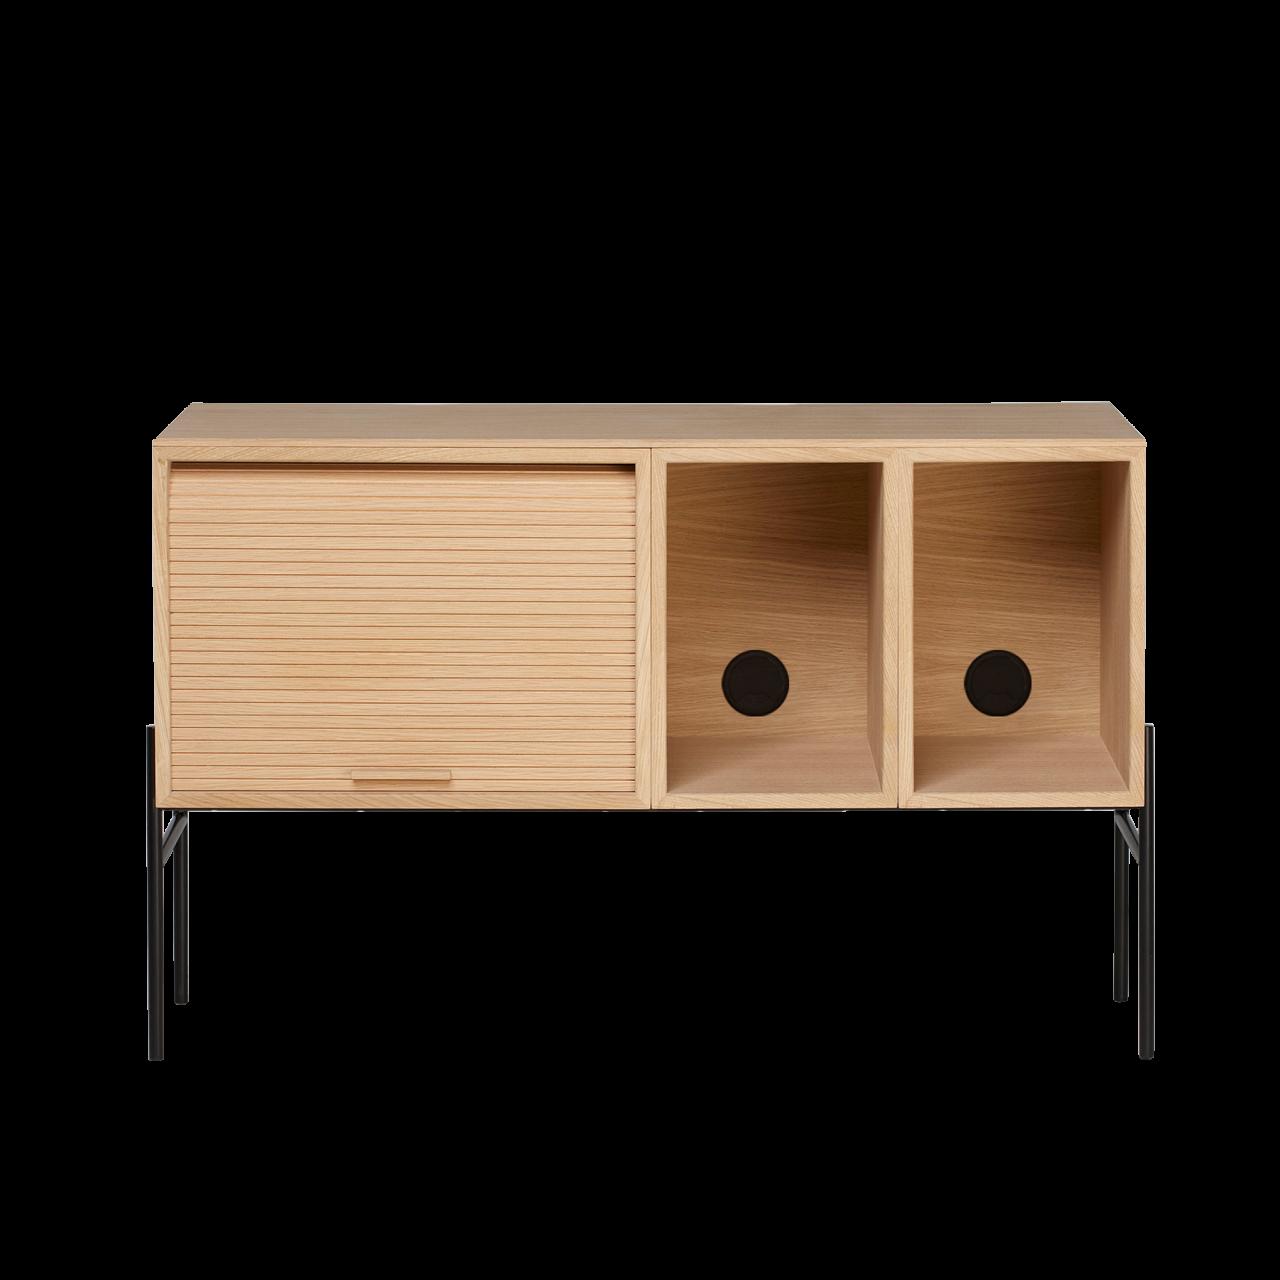 Hifive Sideboard